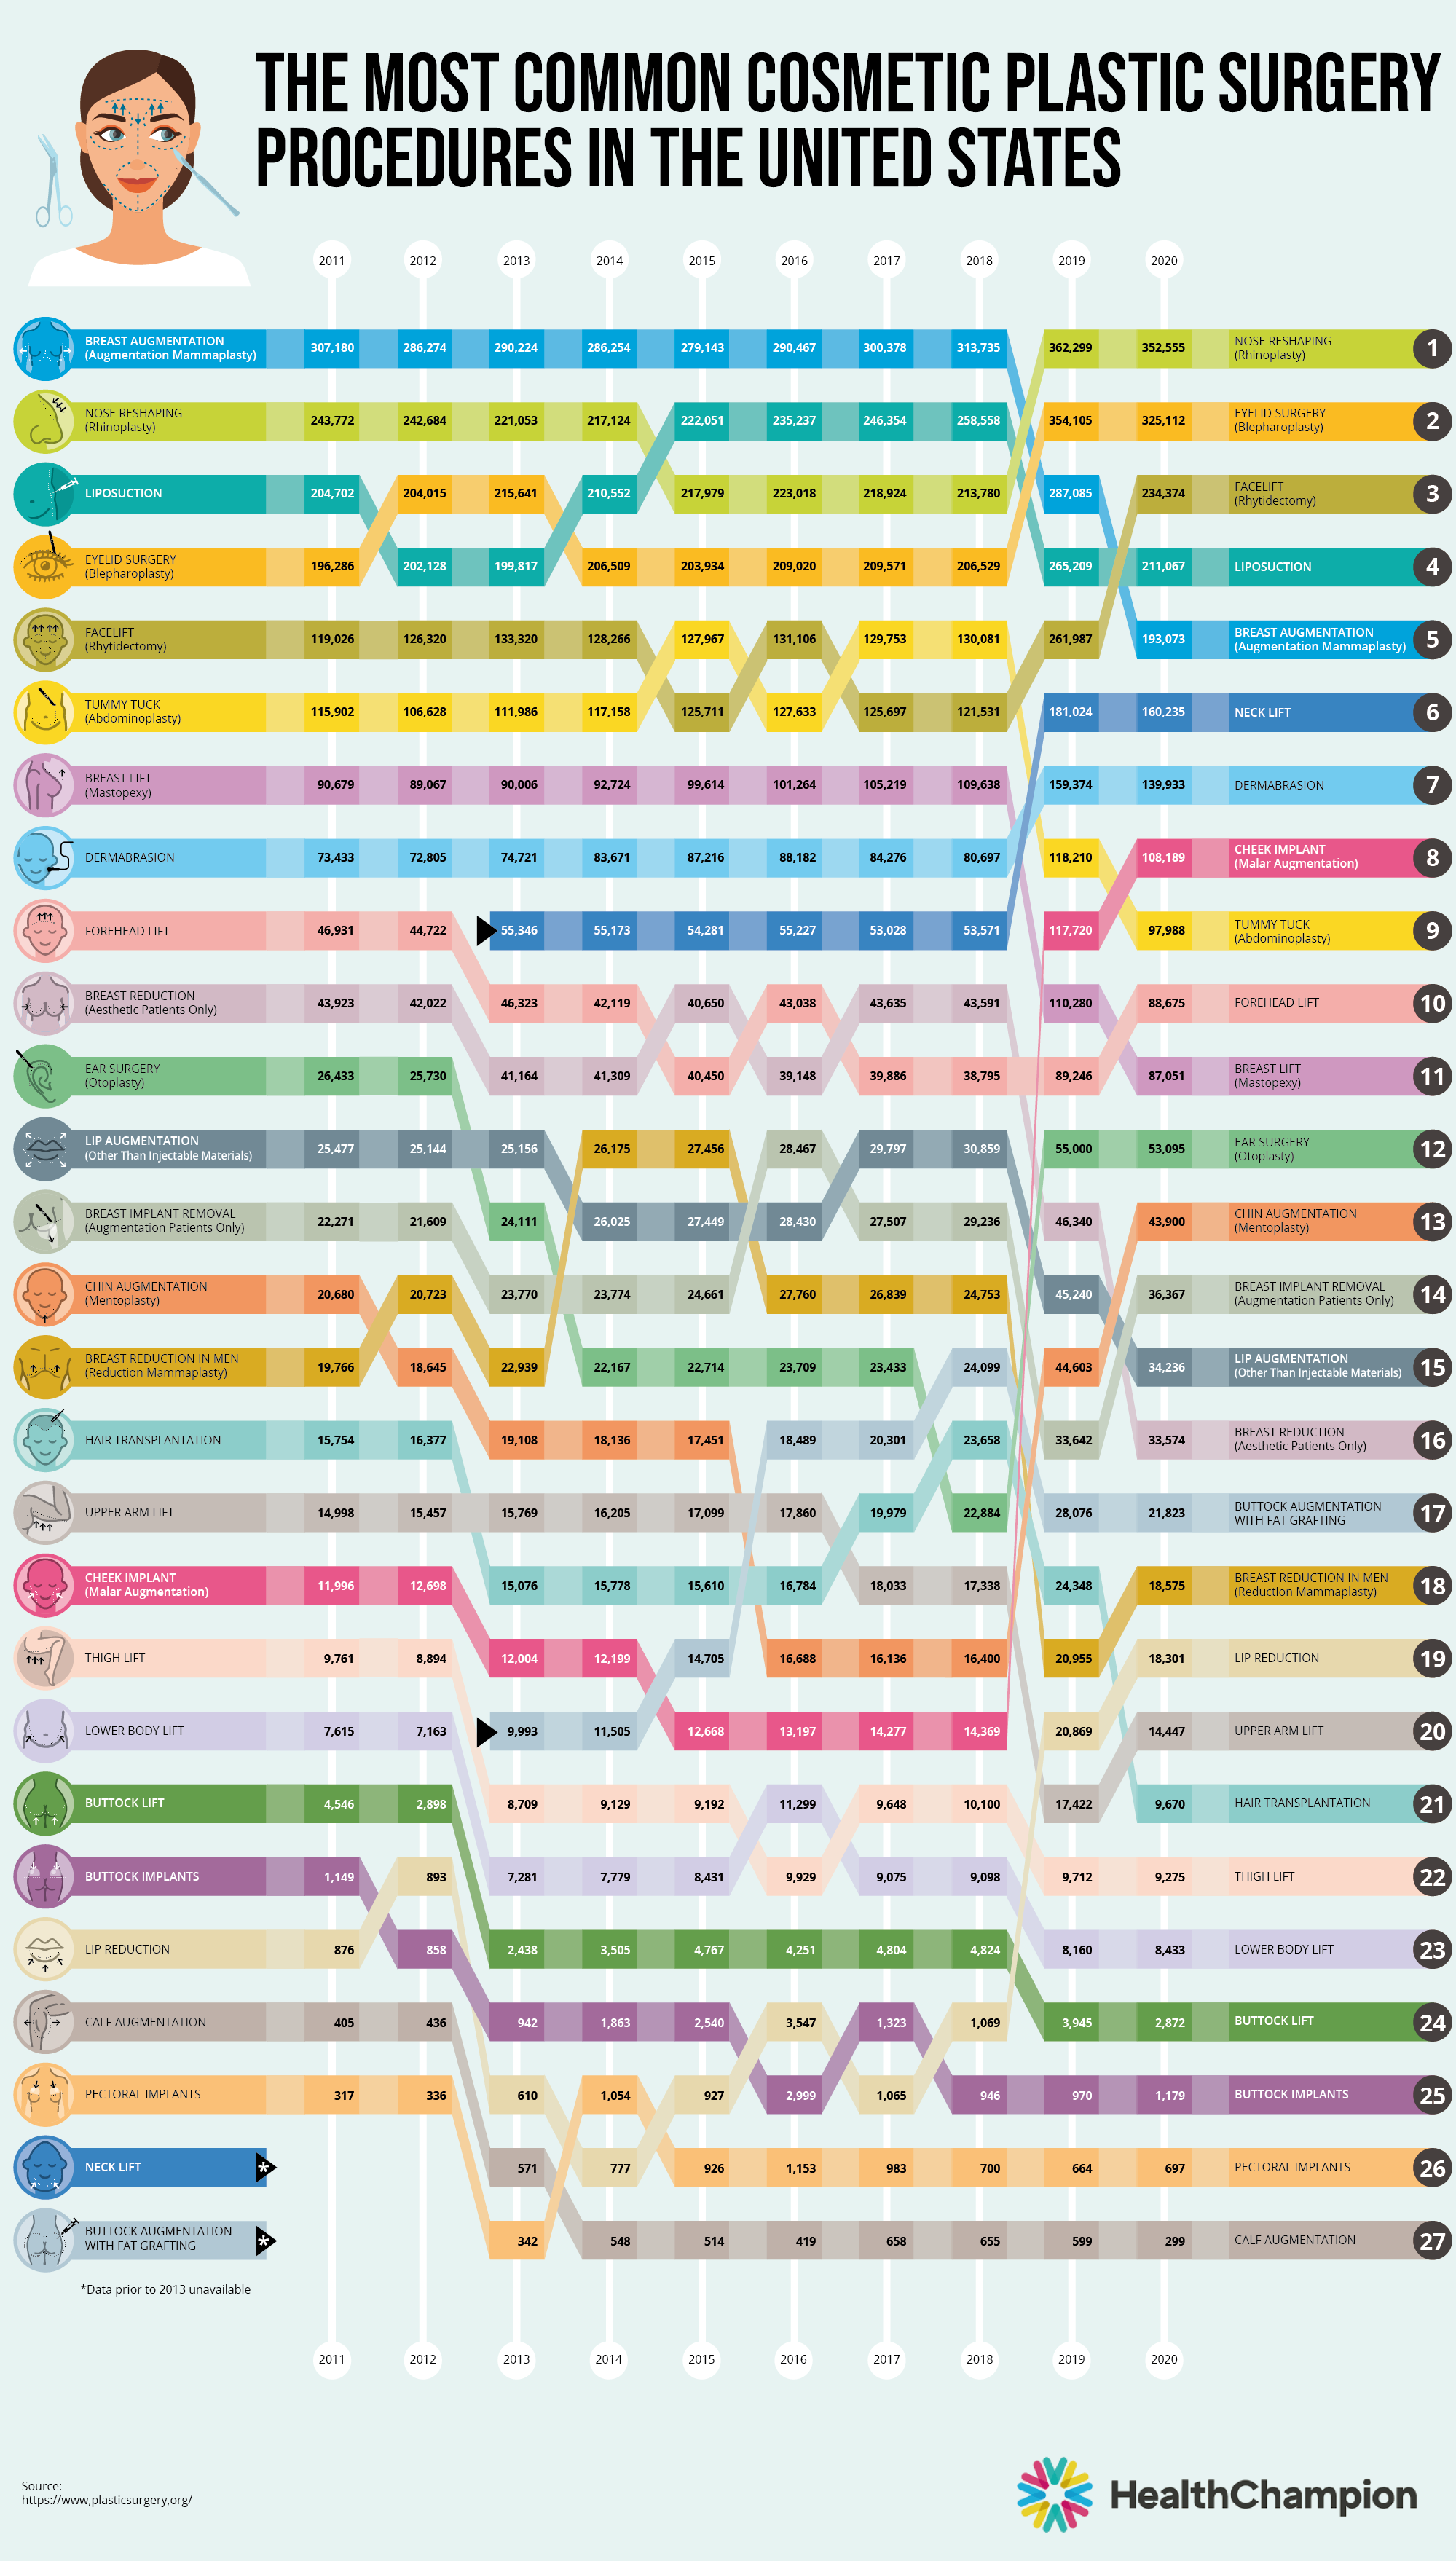 Most Common U.S. Cosmetic Surgery Procedure infographic - HealthChampion